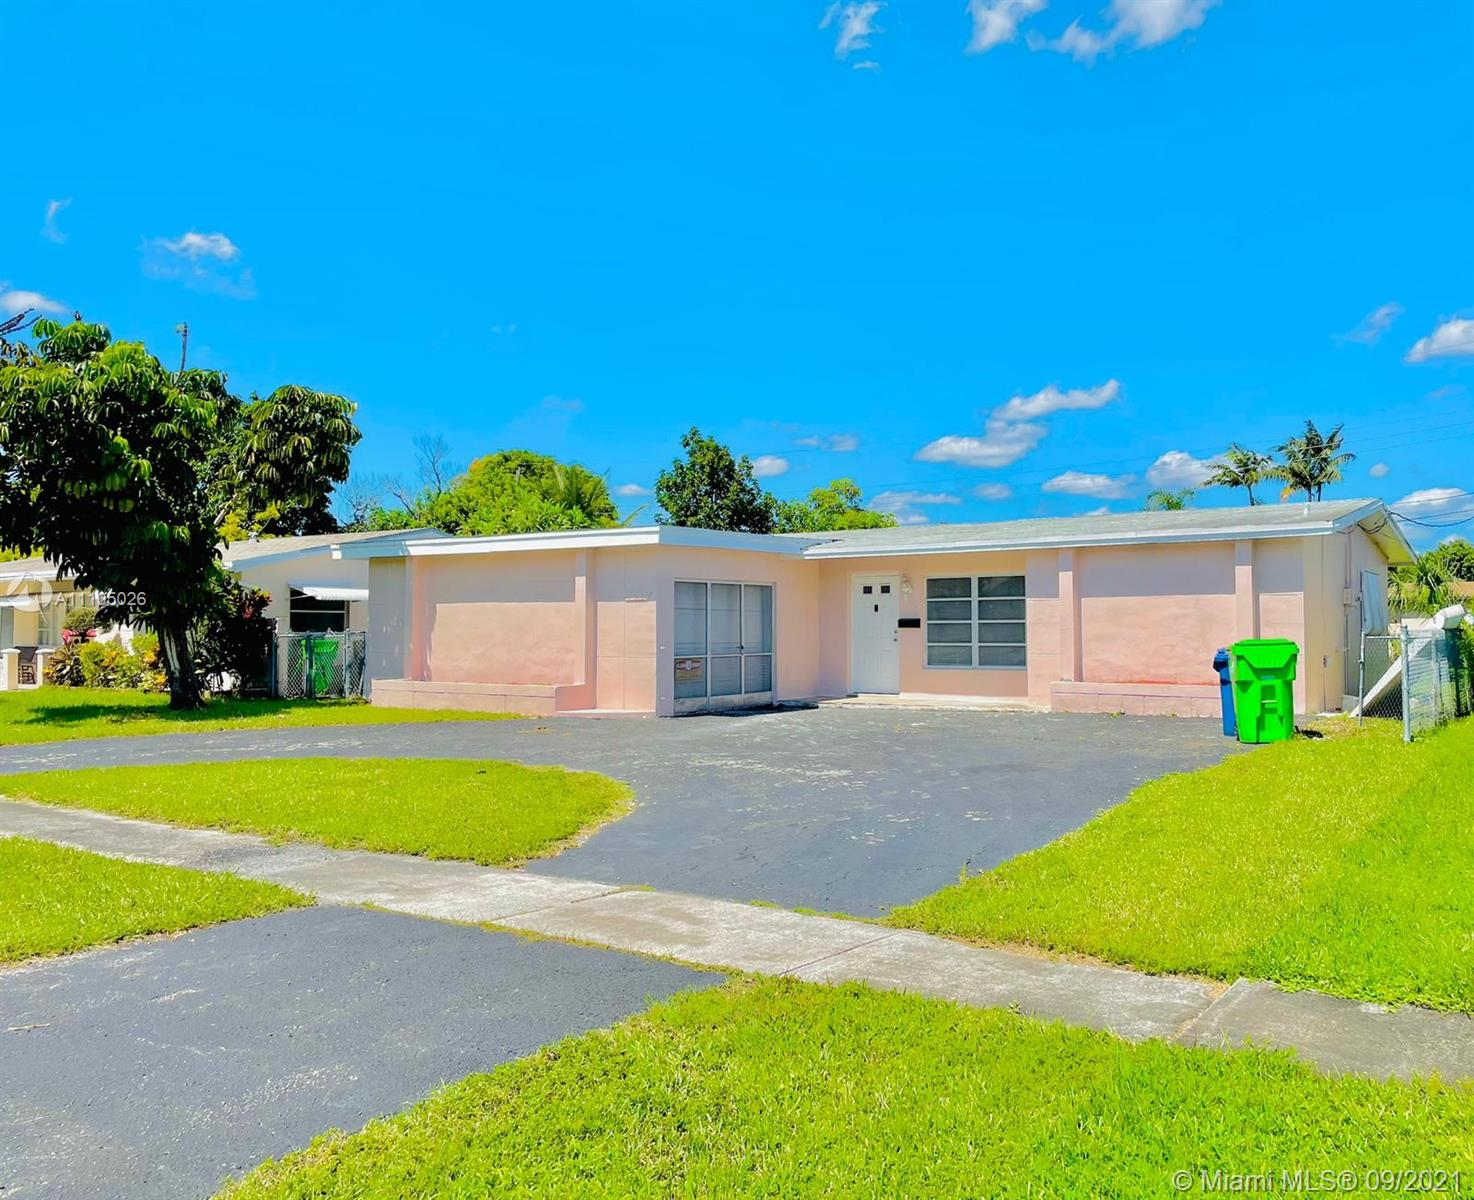 Sunrise Golf Village - 7041 NW 24th Ct, Sunrise, FL 33313